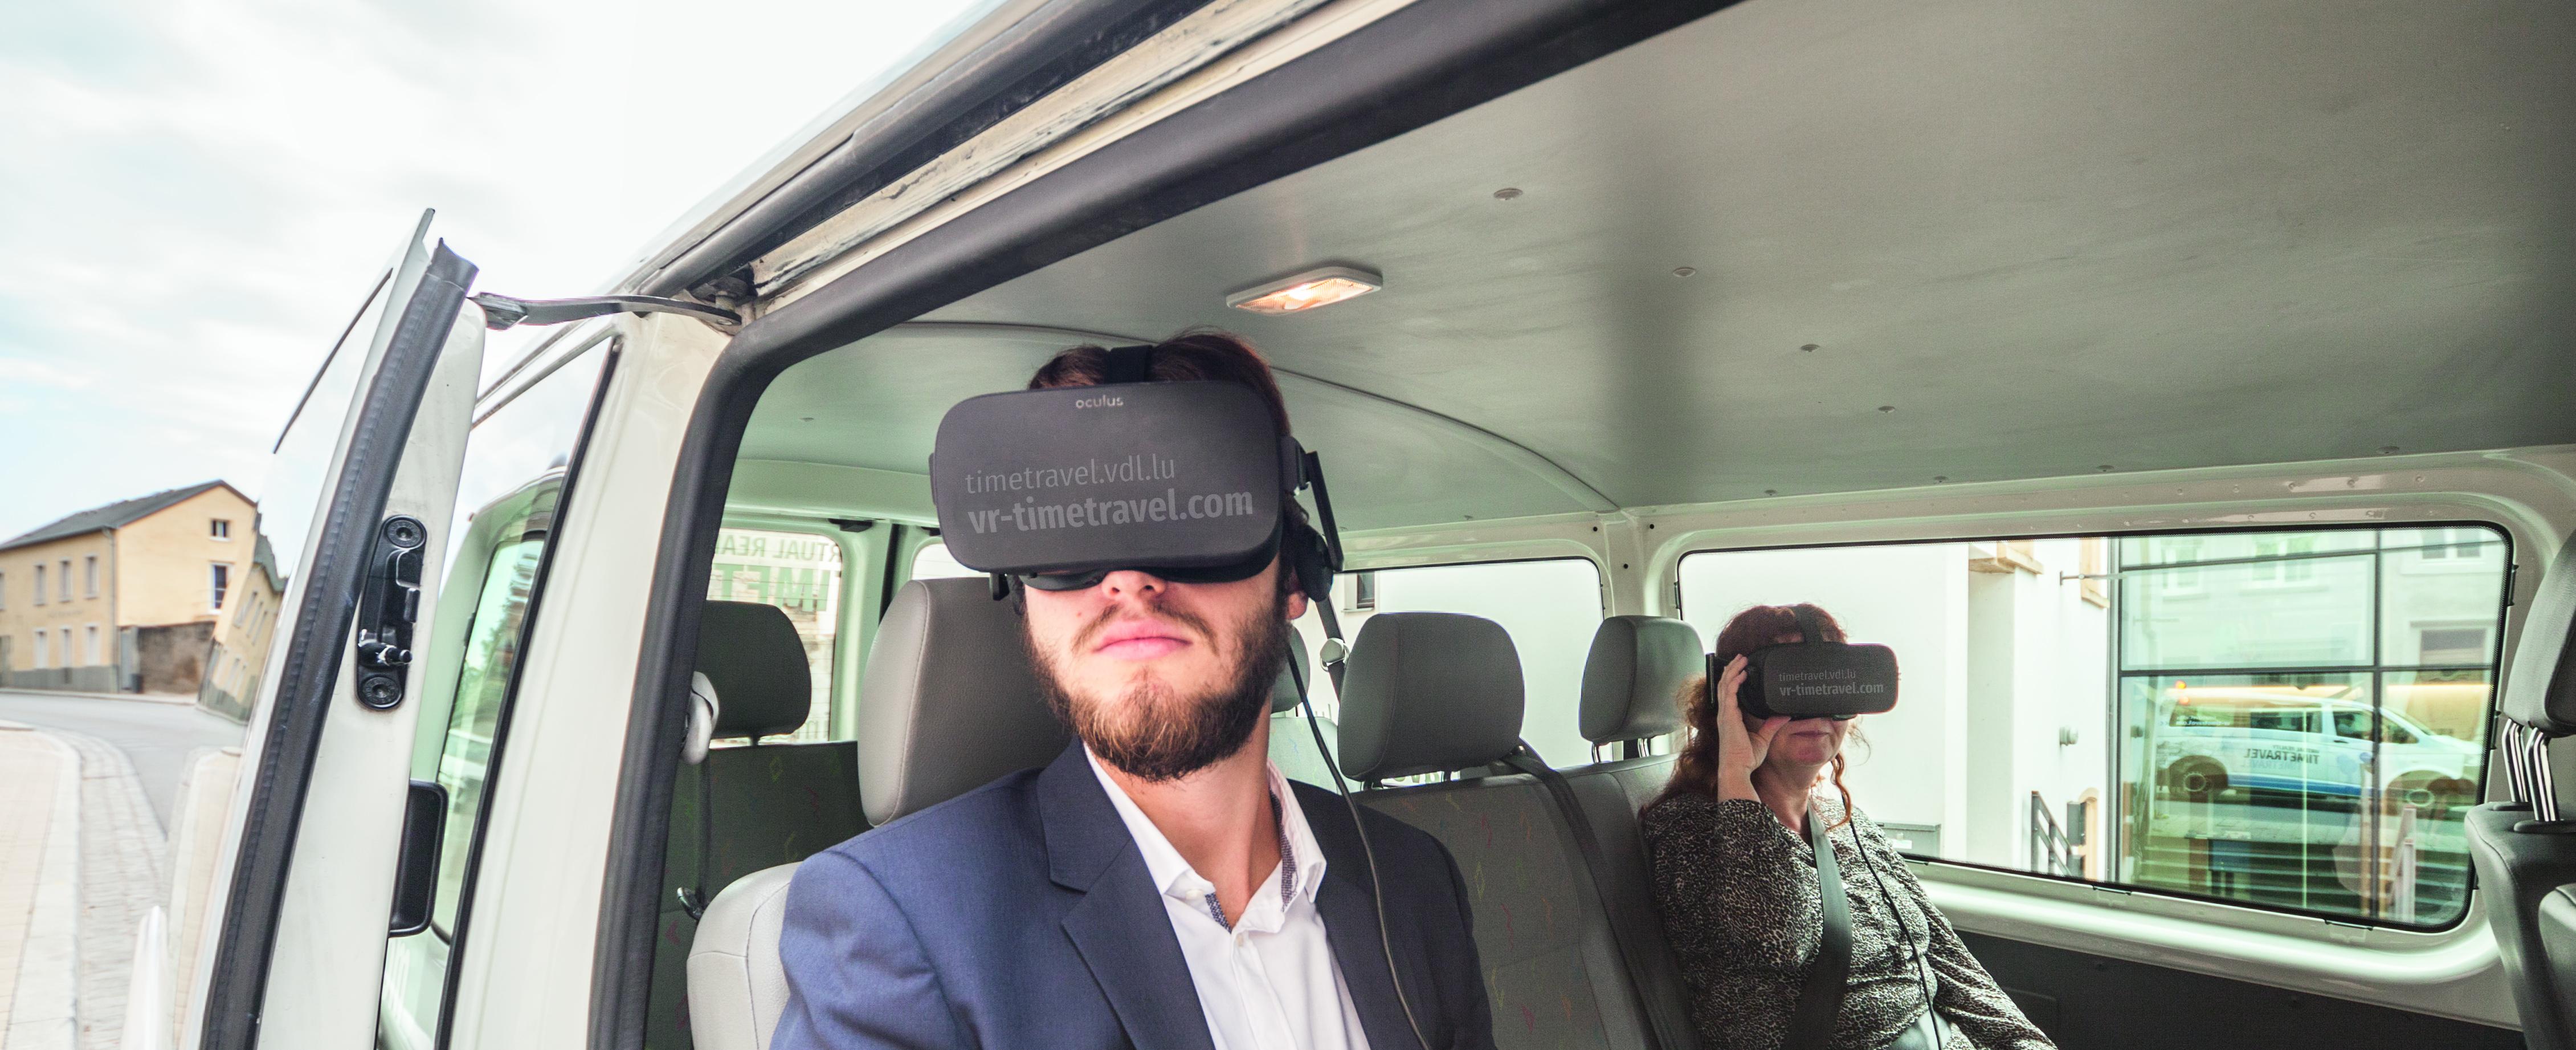 Virtual reality tour guide copyright ville de luxembourg urbantimetravel...